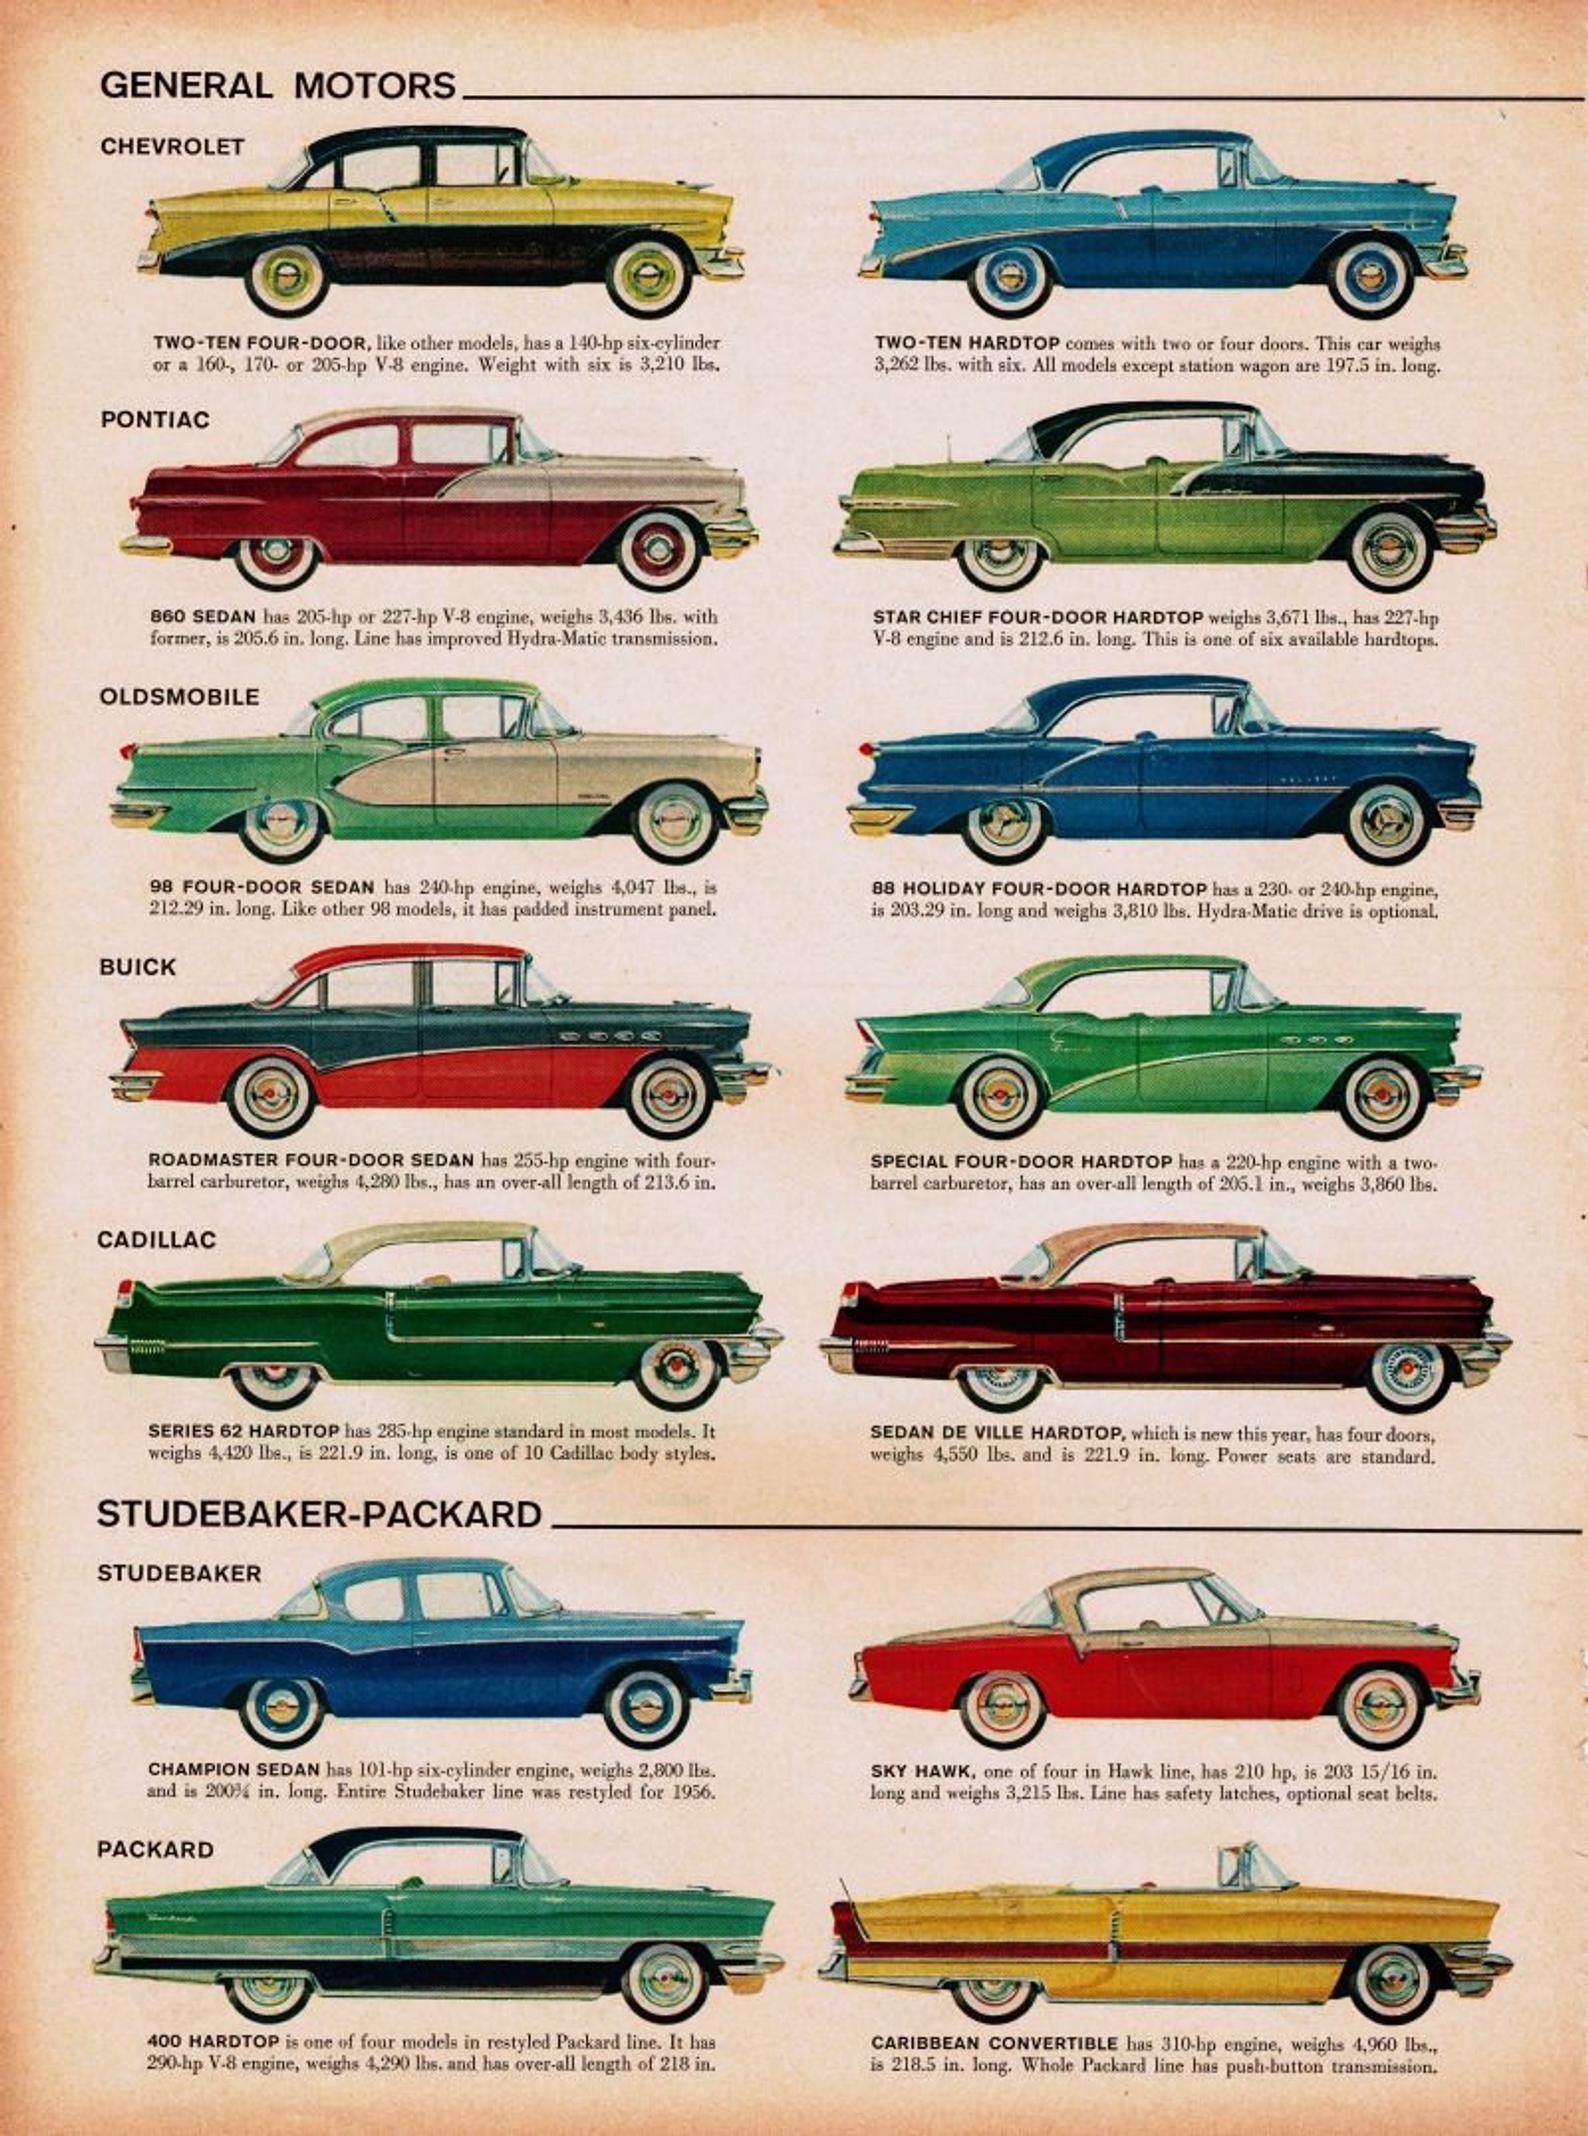 vintage retro mid century 1950s classic american cars illustration sedan convertible digital download